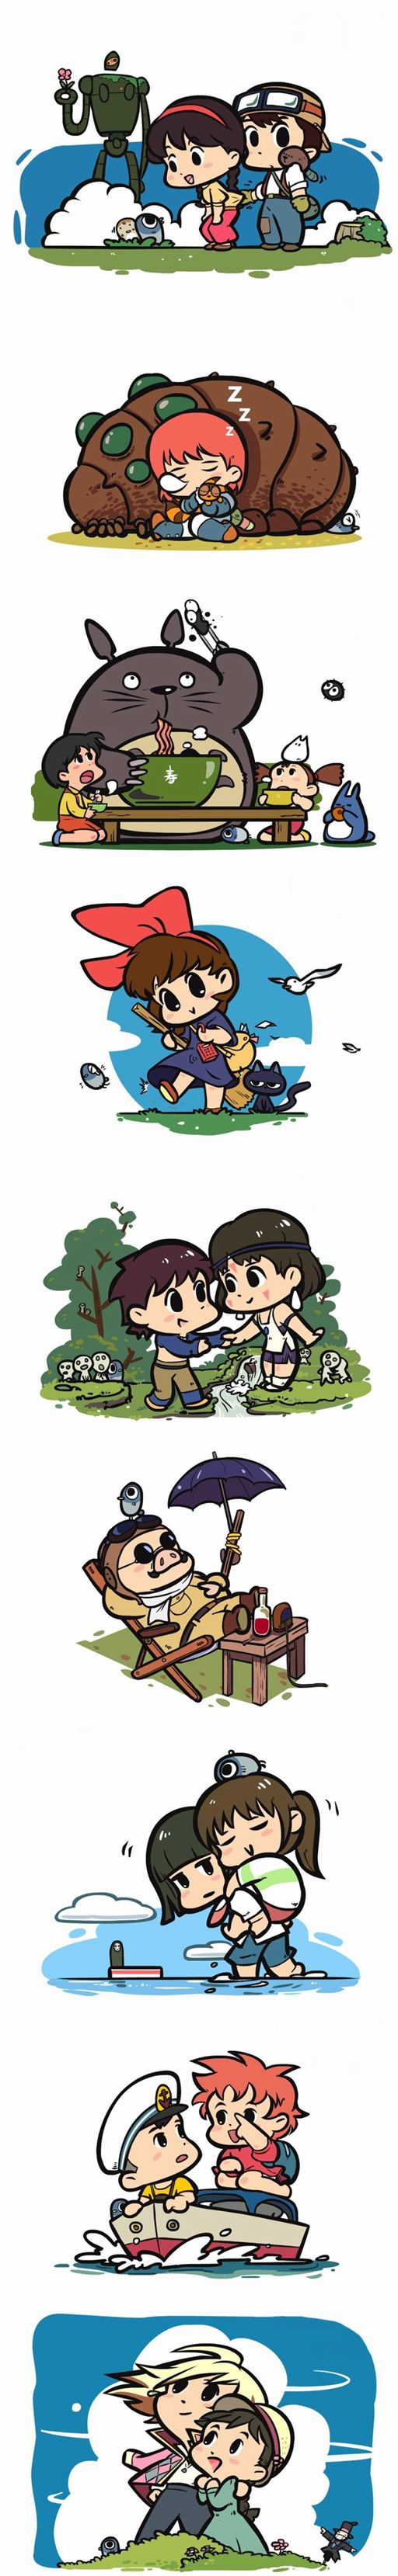 Chibby Ghibli characters